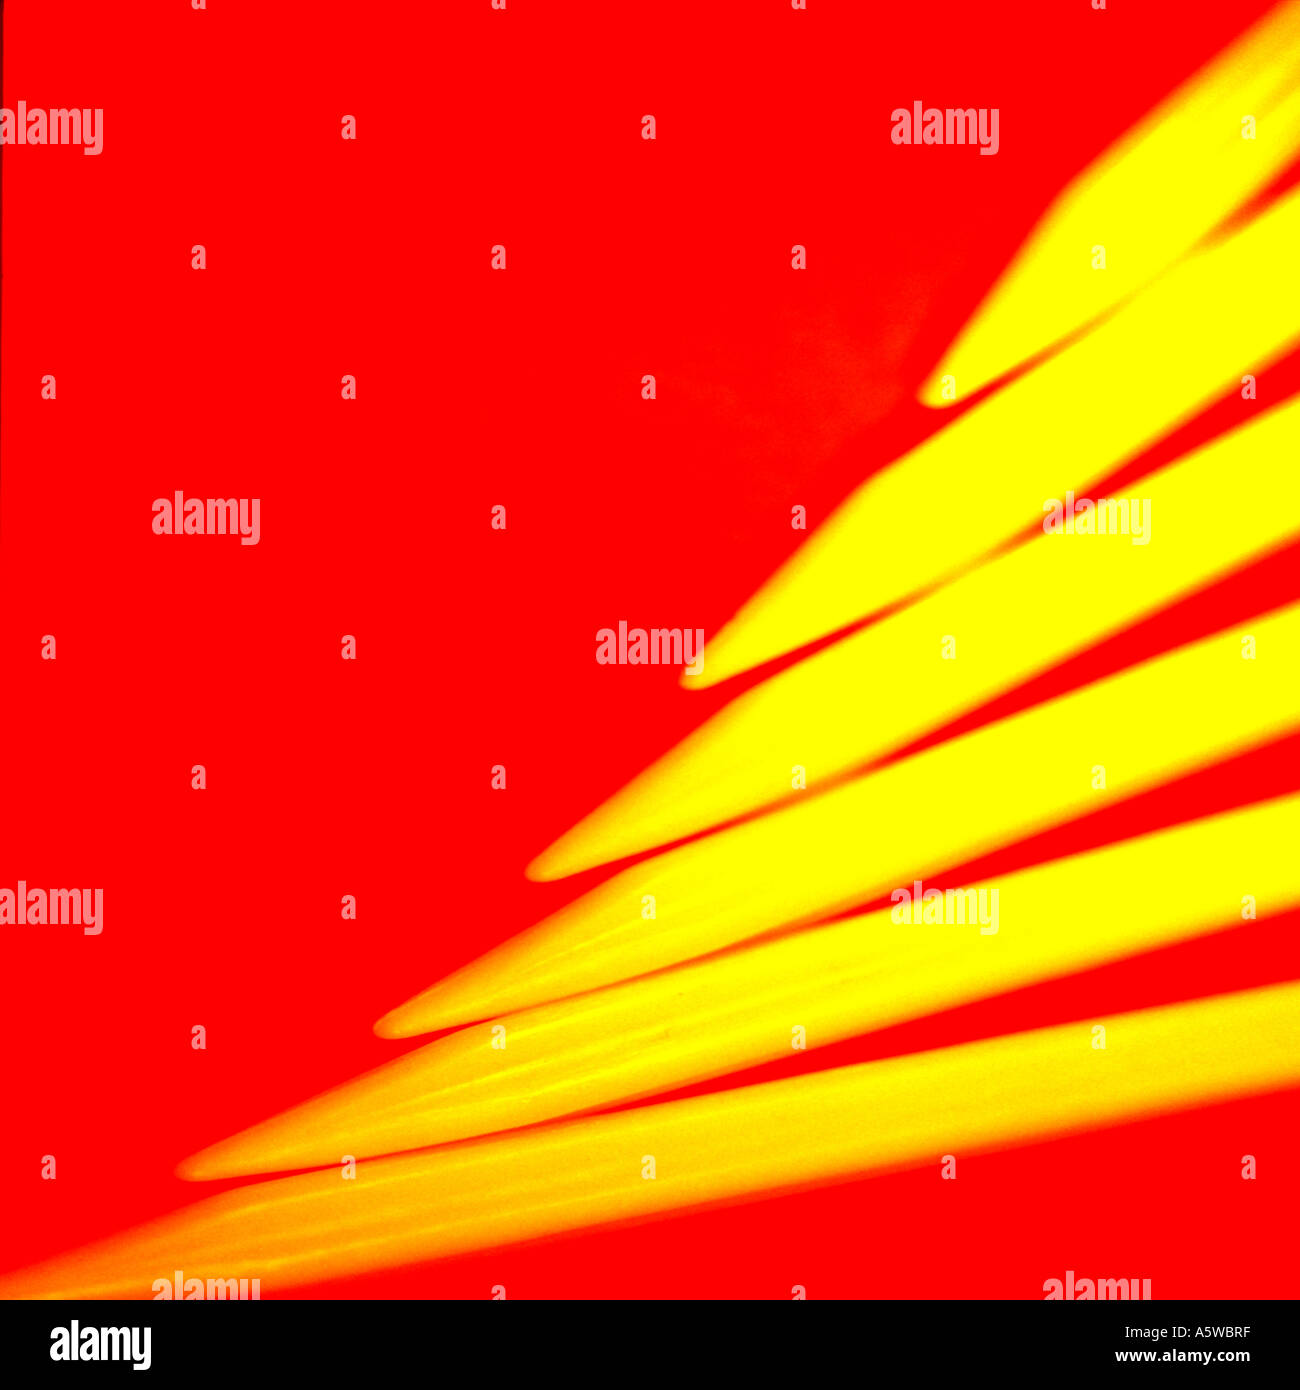 Espigas de color amarillo sobre rojo Imagen De Stock